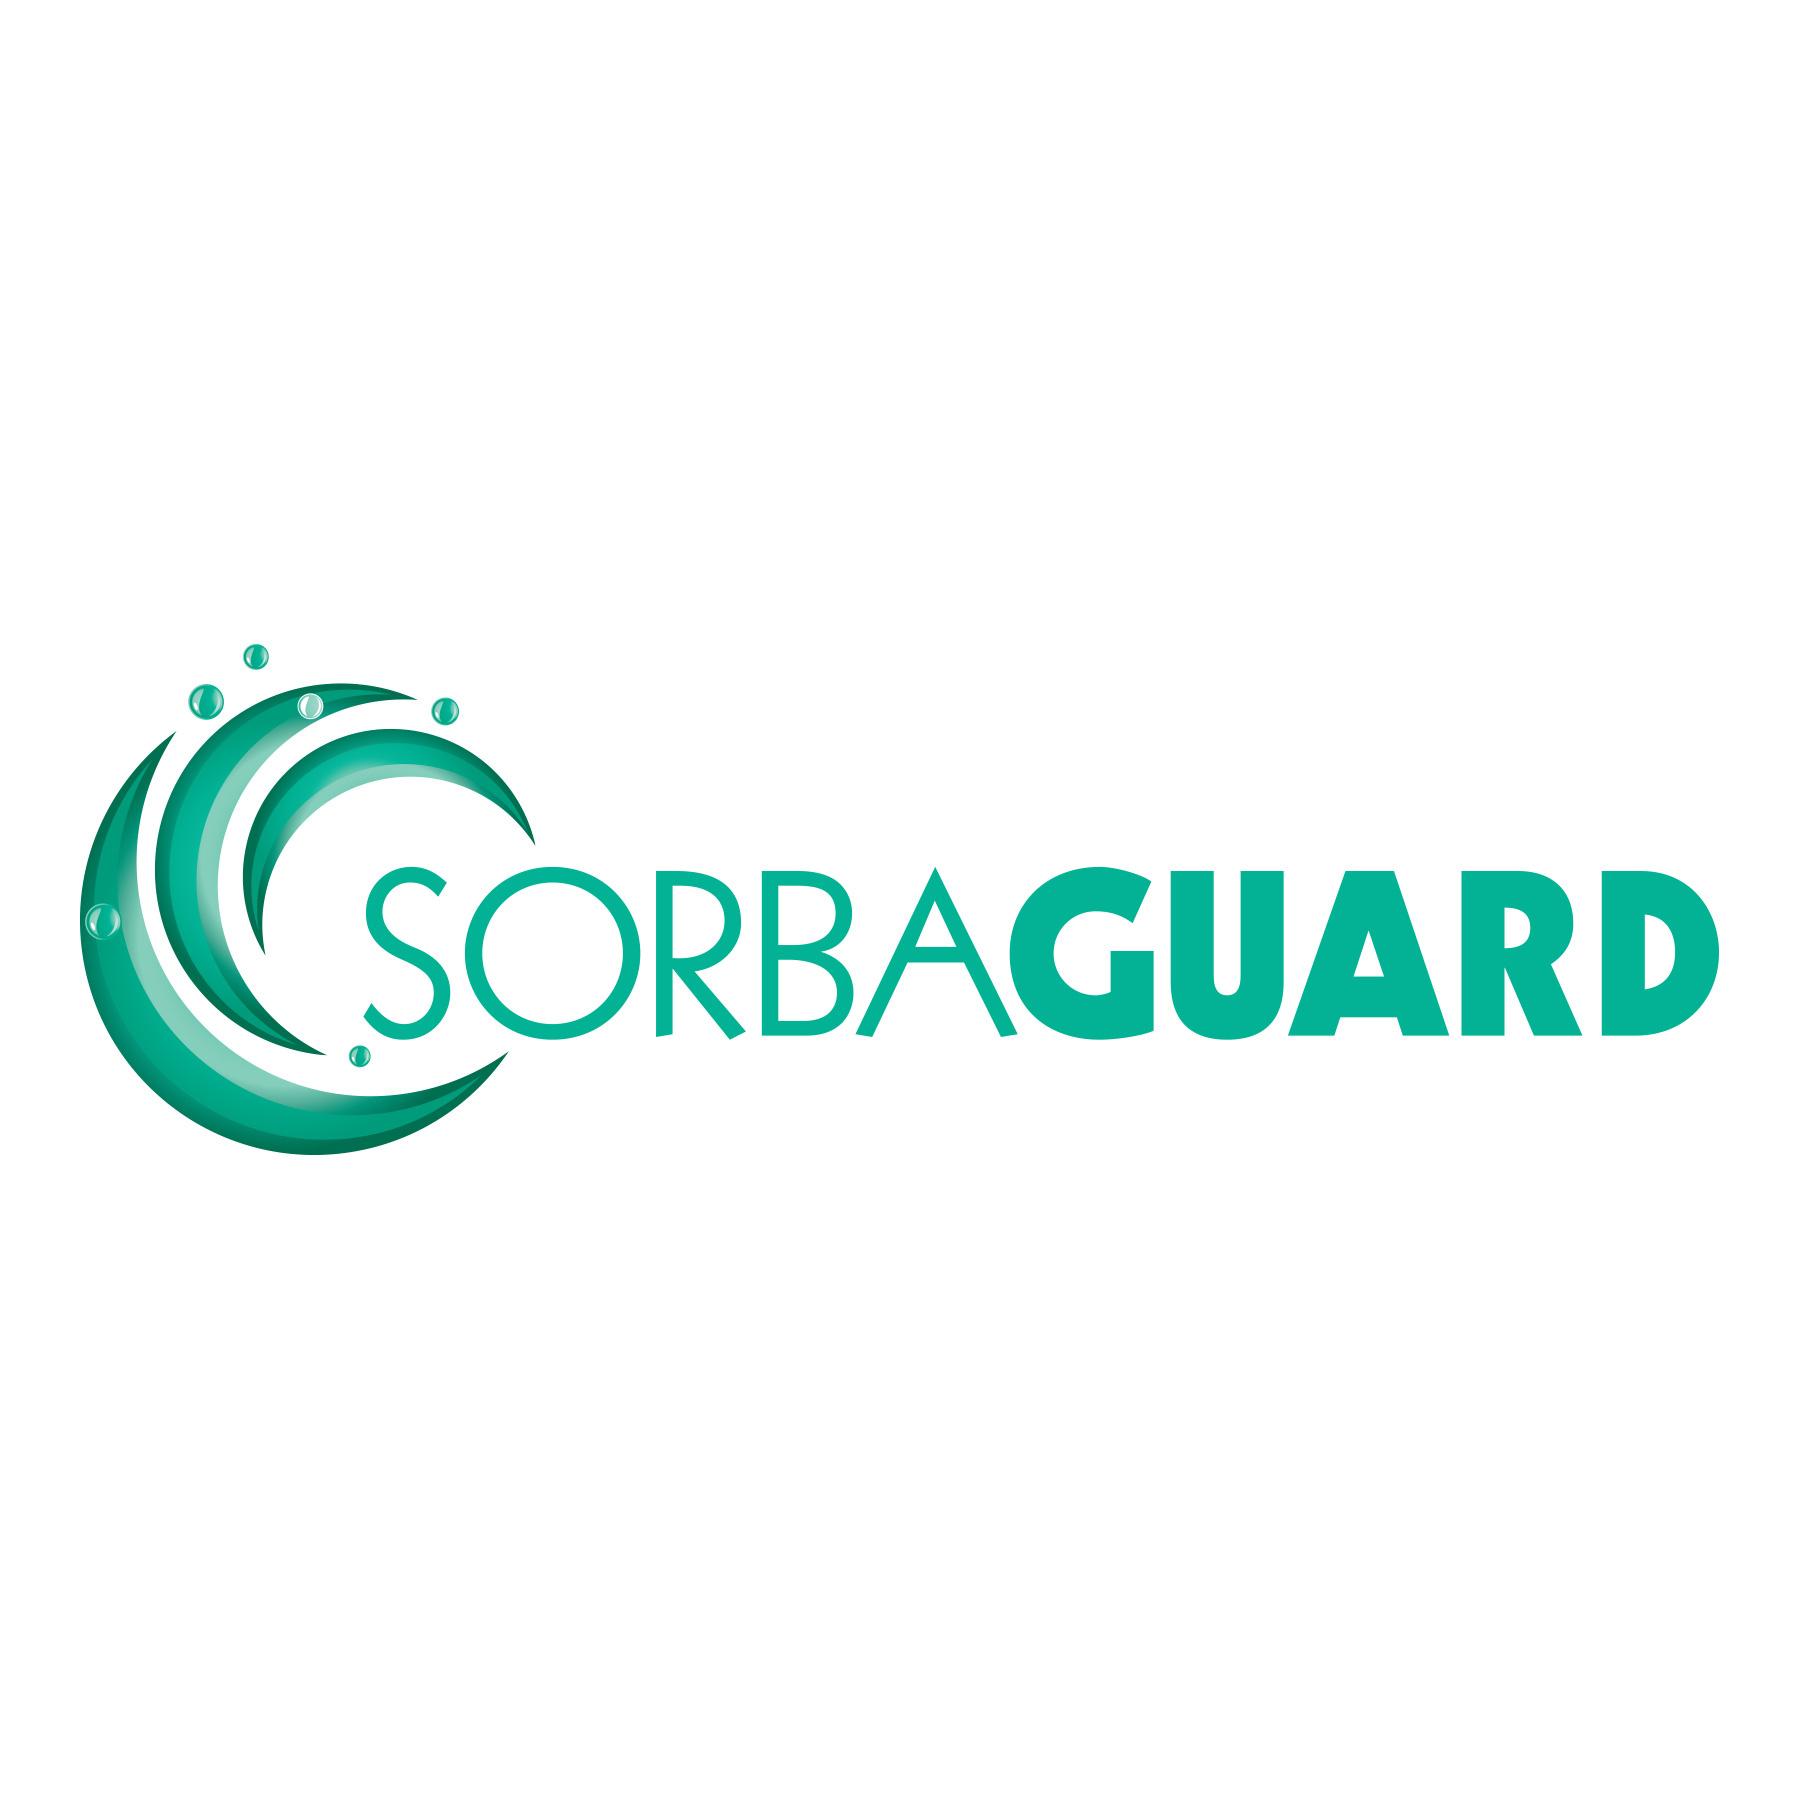 Artext's SorbaGuard Product Logo